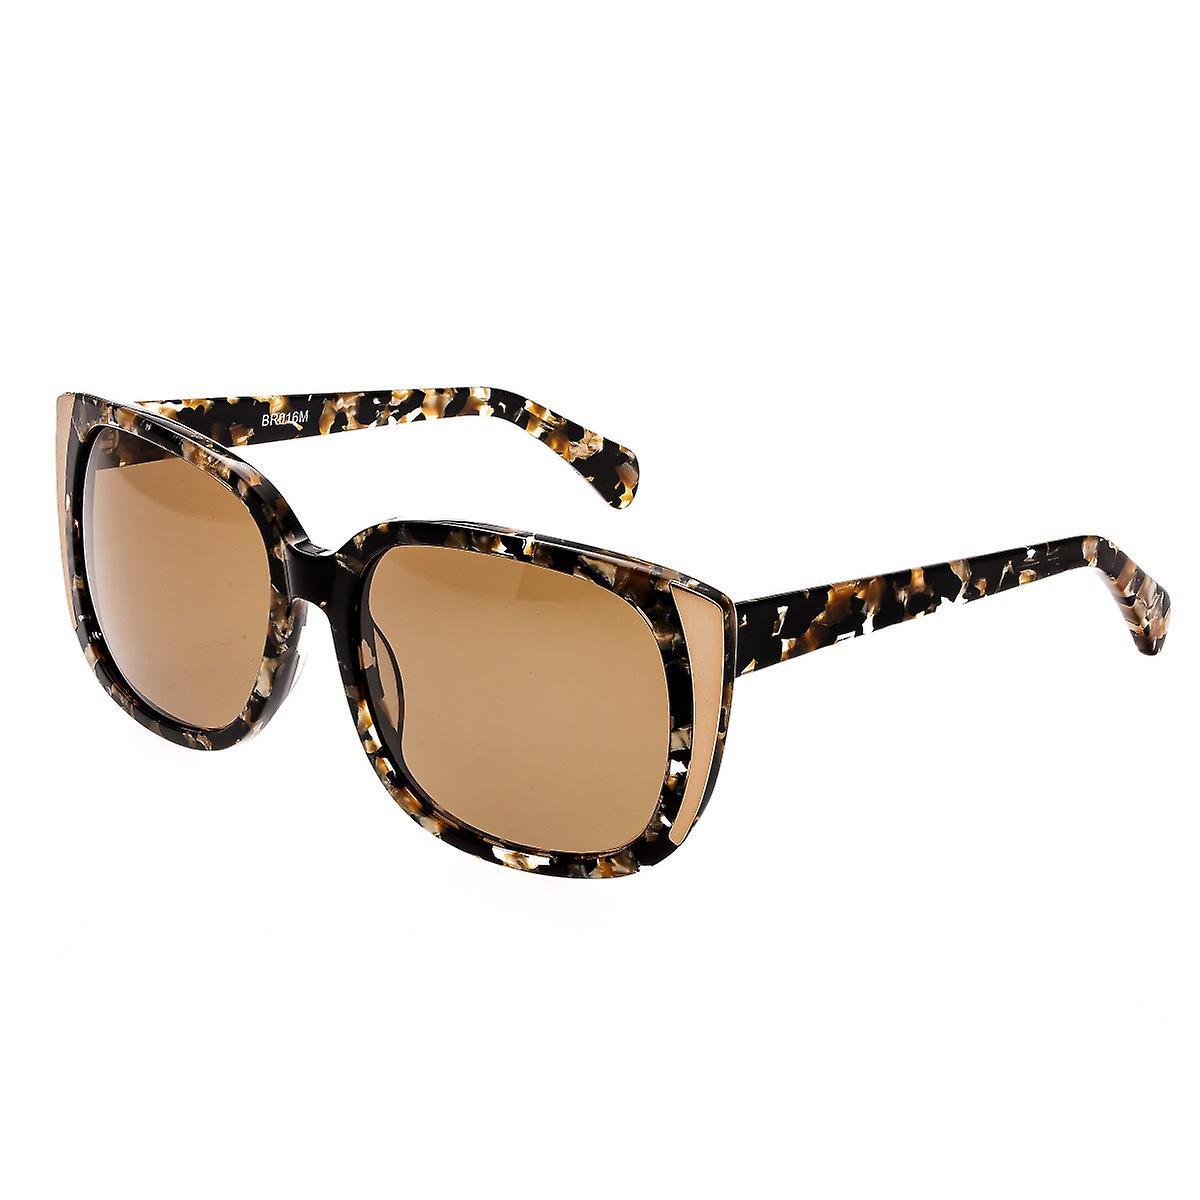 Bertha Natalia Polarized lunettes de soleil - Multi marron